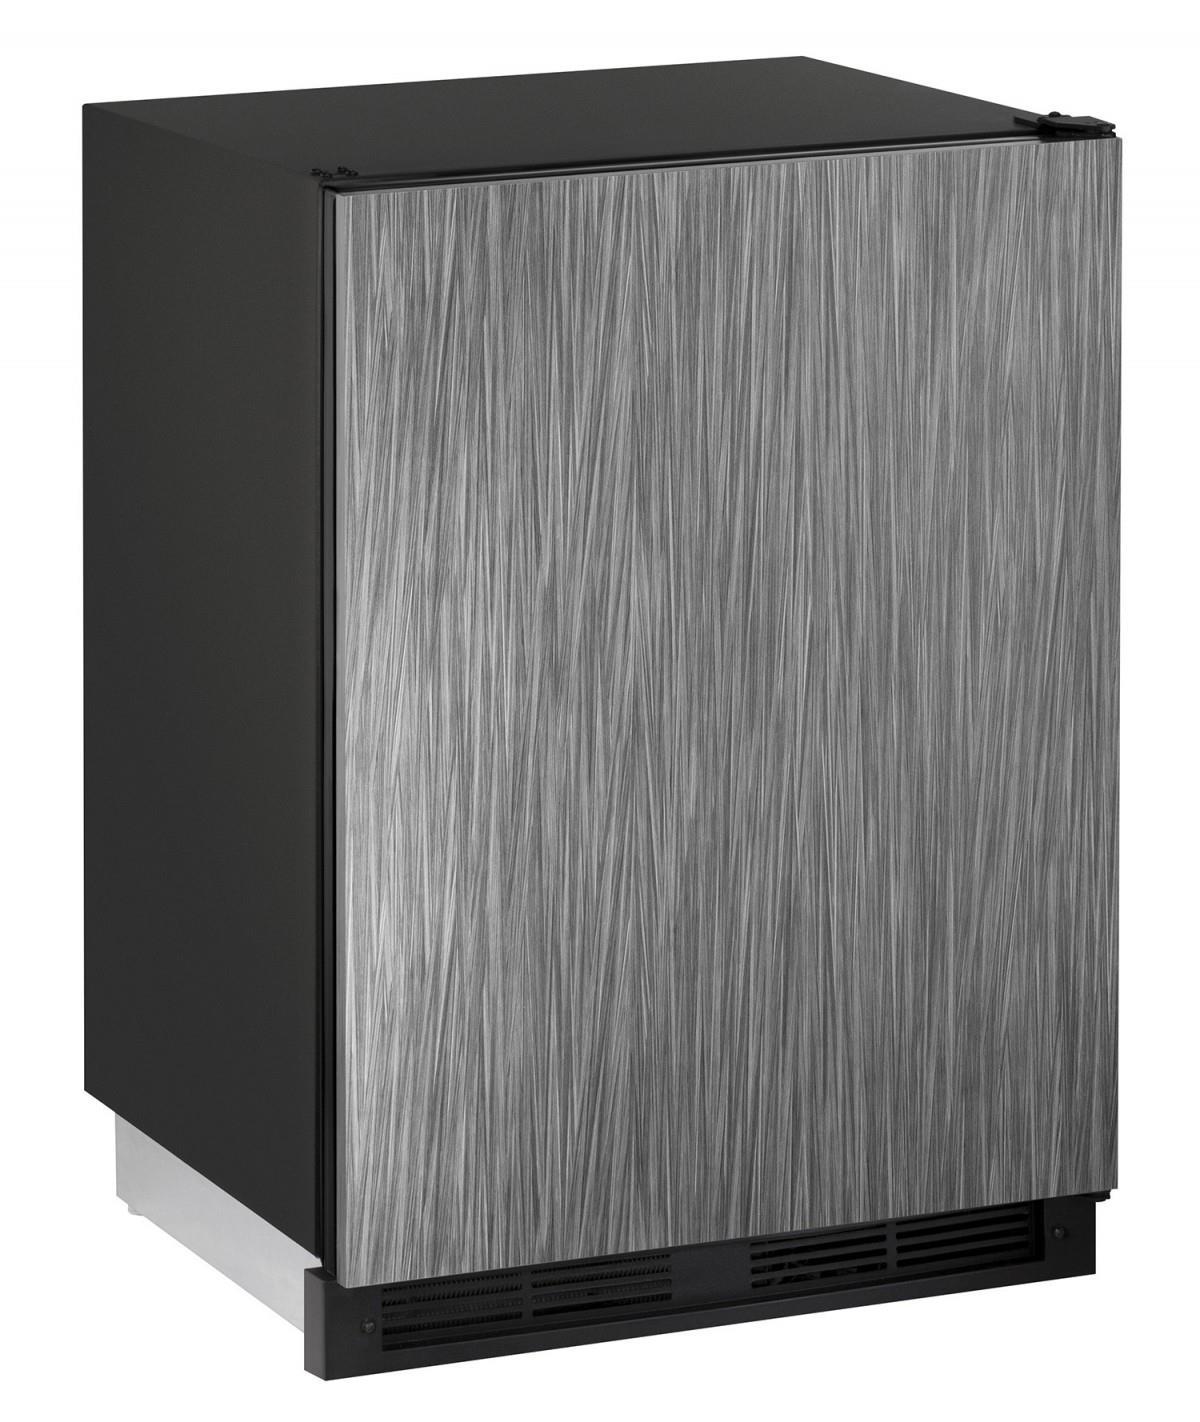 U-Line Refrigerators 4.2 cu. ft. Built-in Refrigerator/Freezer - Item Number: U-CO1224FINT-00A